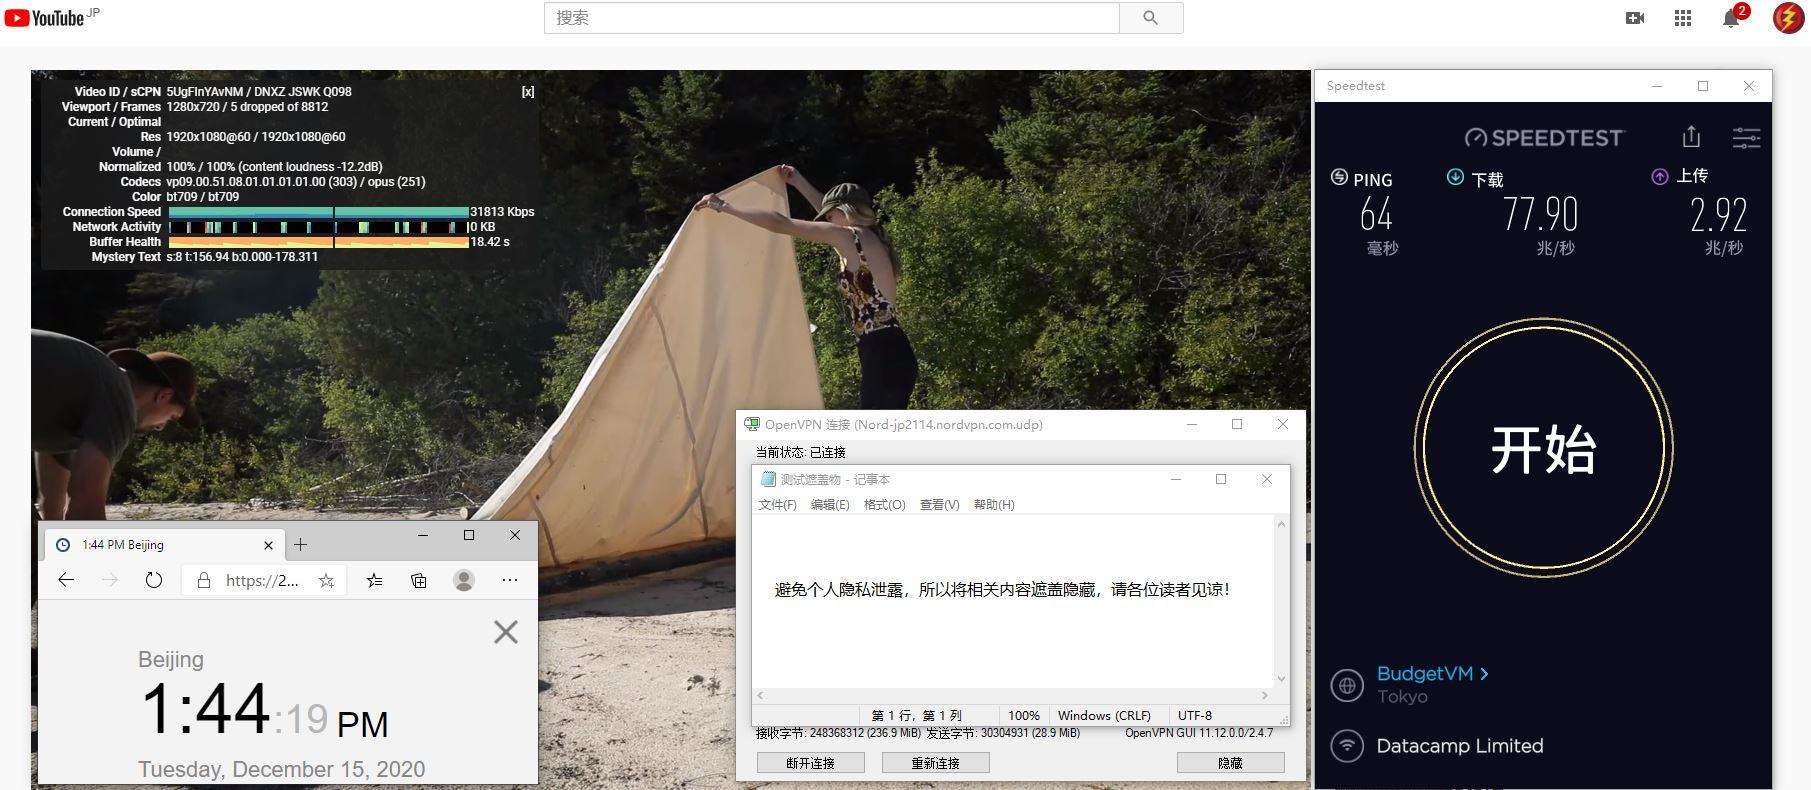 Windows10 NordVPN OpenVPN Gui JP2114 服务器 中国VPN 翻墙 科学上网 测试 - 20201215